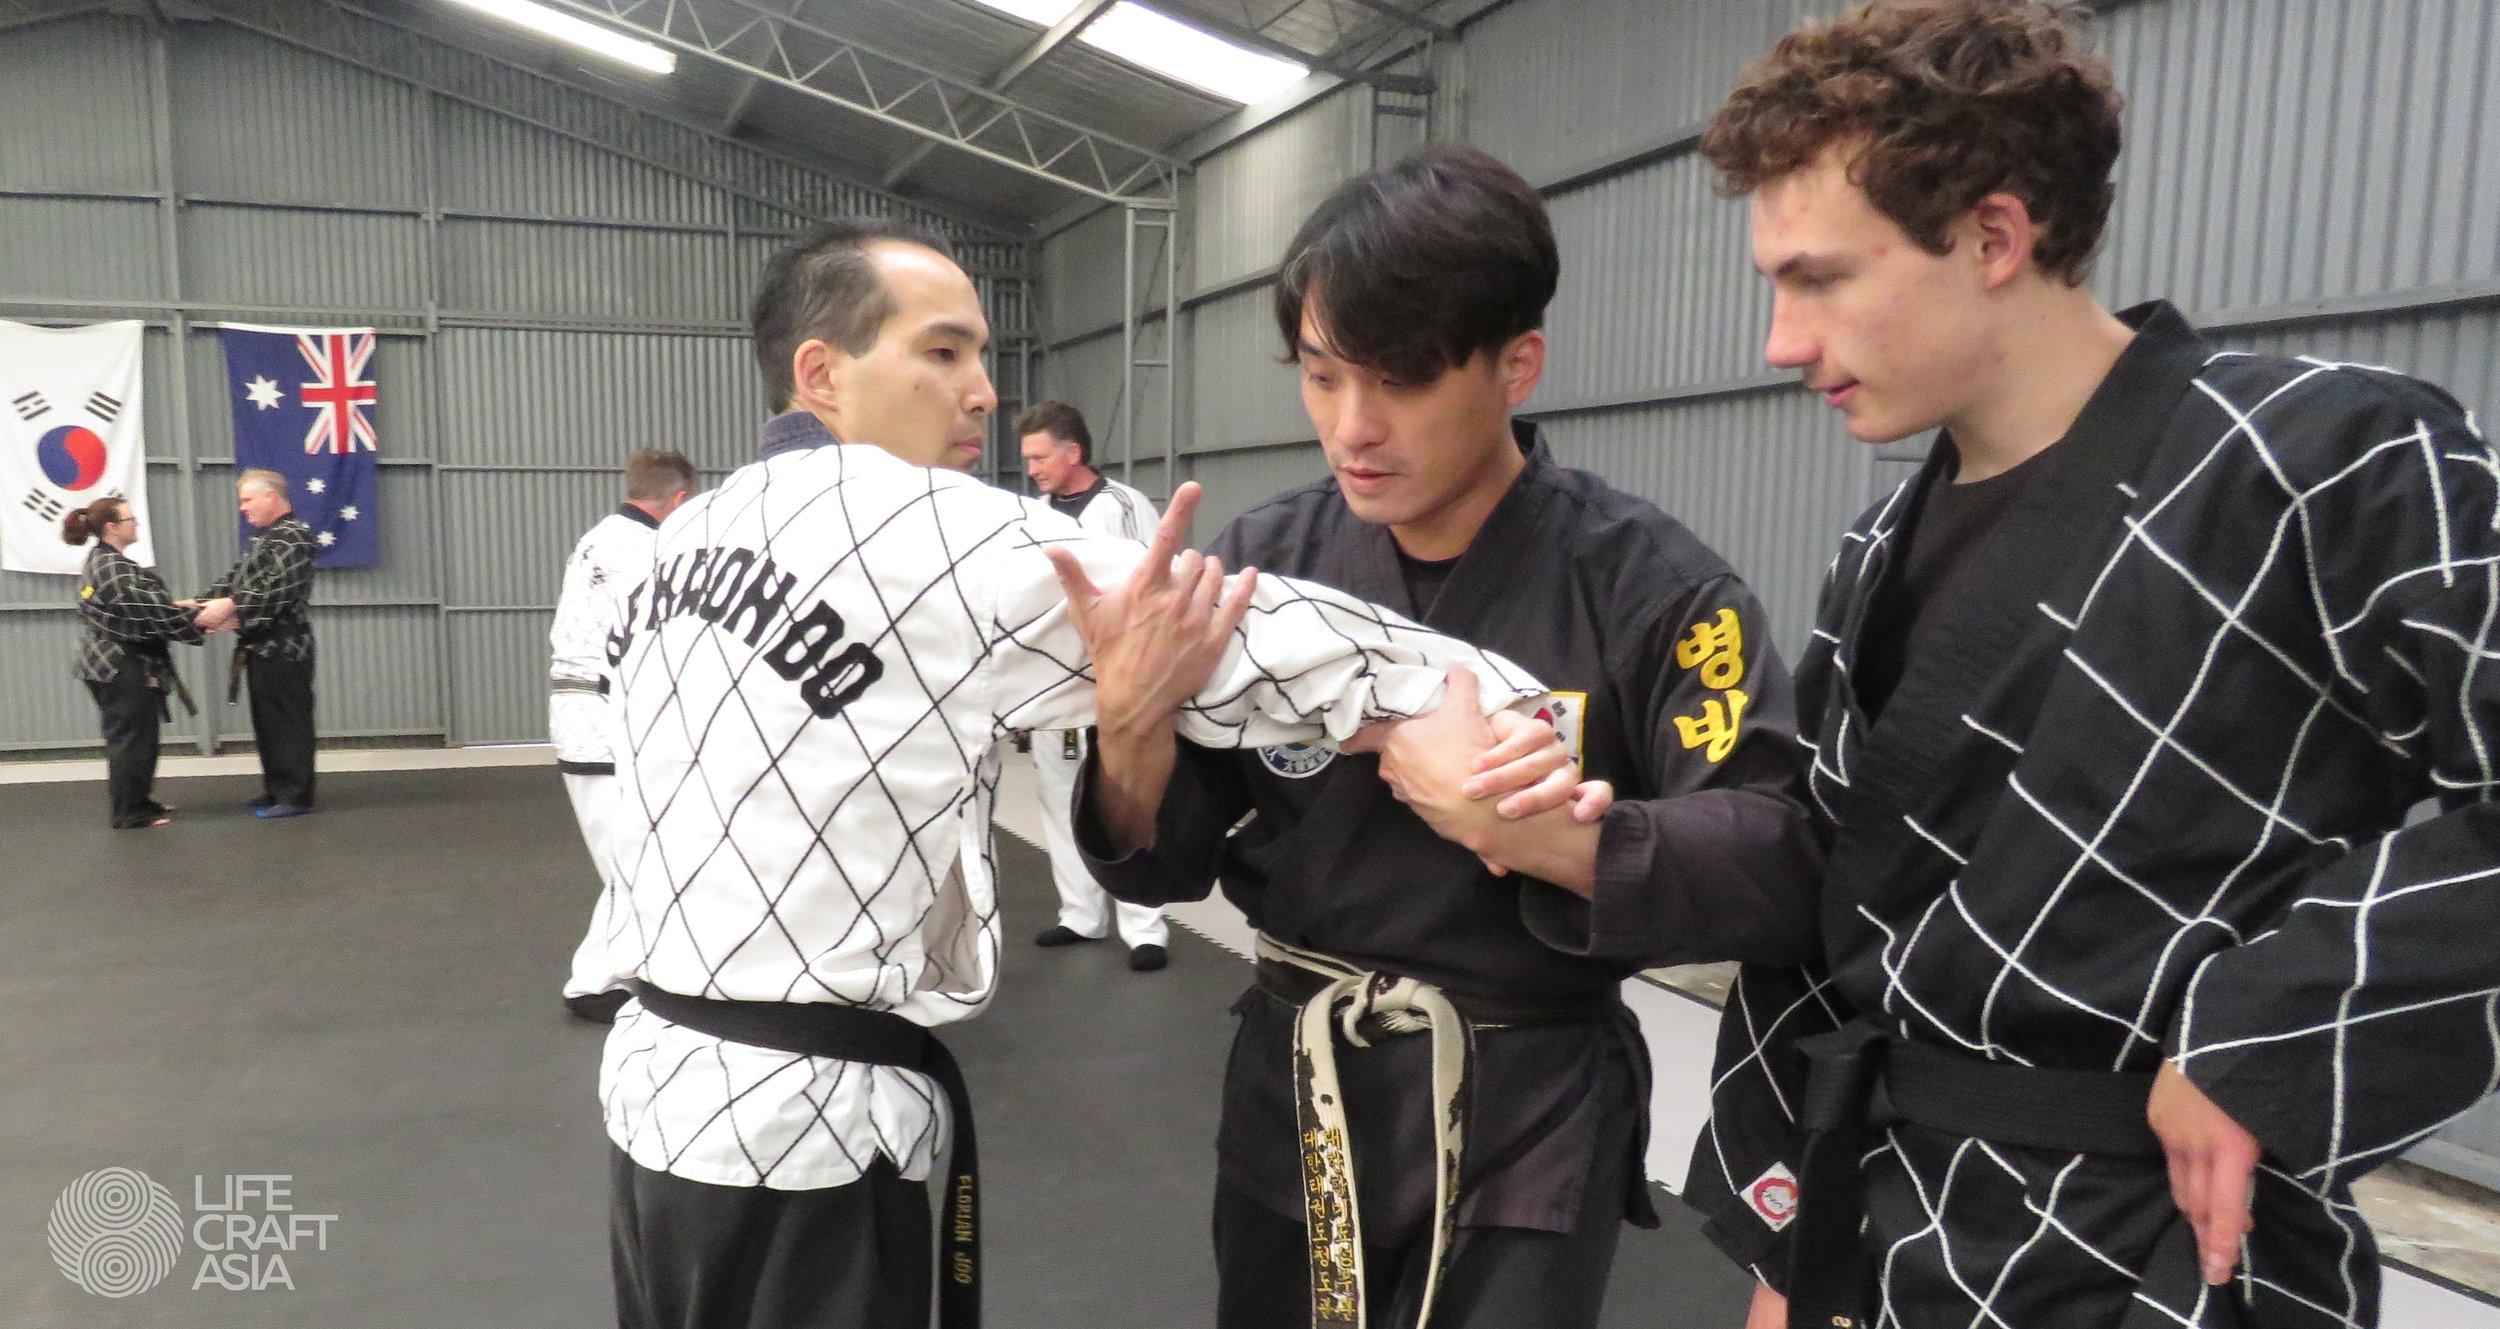 (Lfeft) Master Florian Joo, (Middle) Master Roy Ng, (Right) Jack Wild